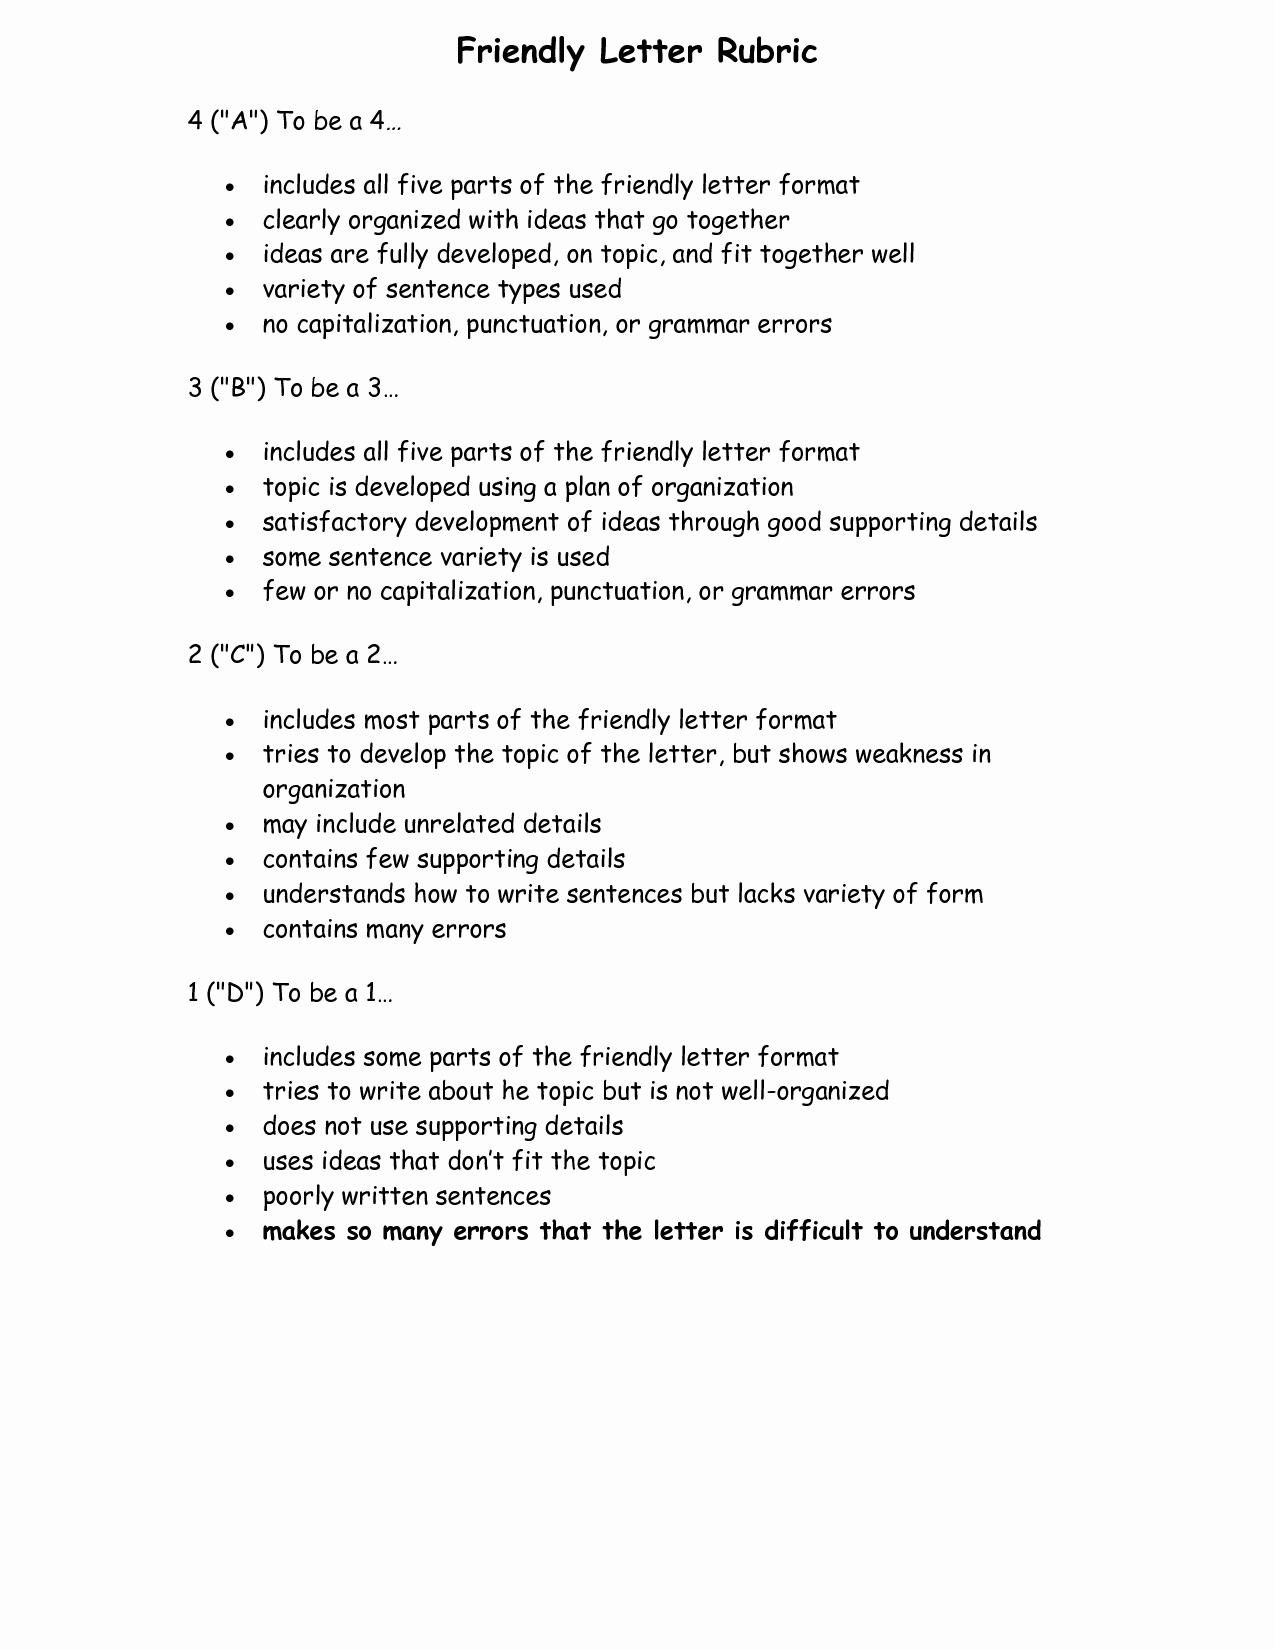 Mla Personal Letter format Elegant Best S Of Friendly Letter format Business Sample